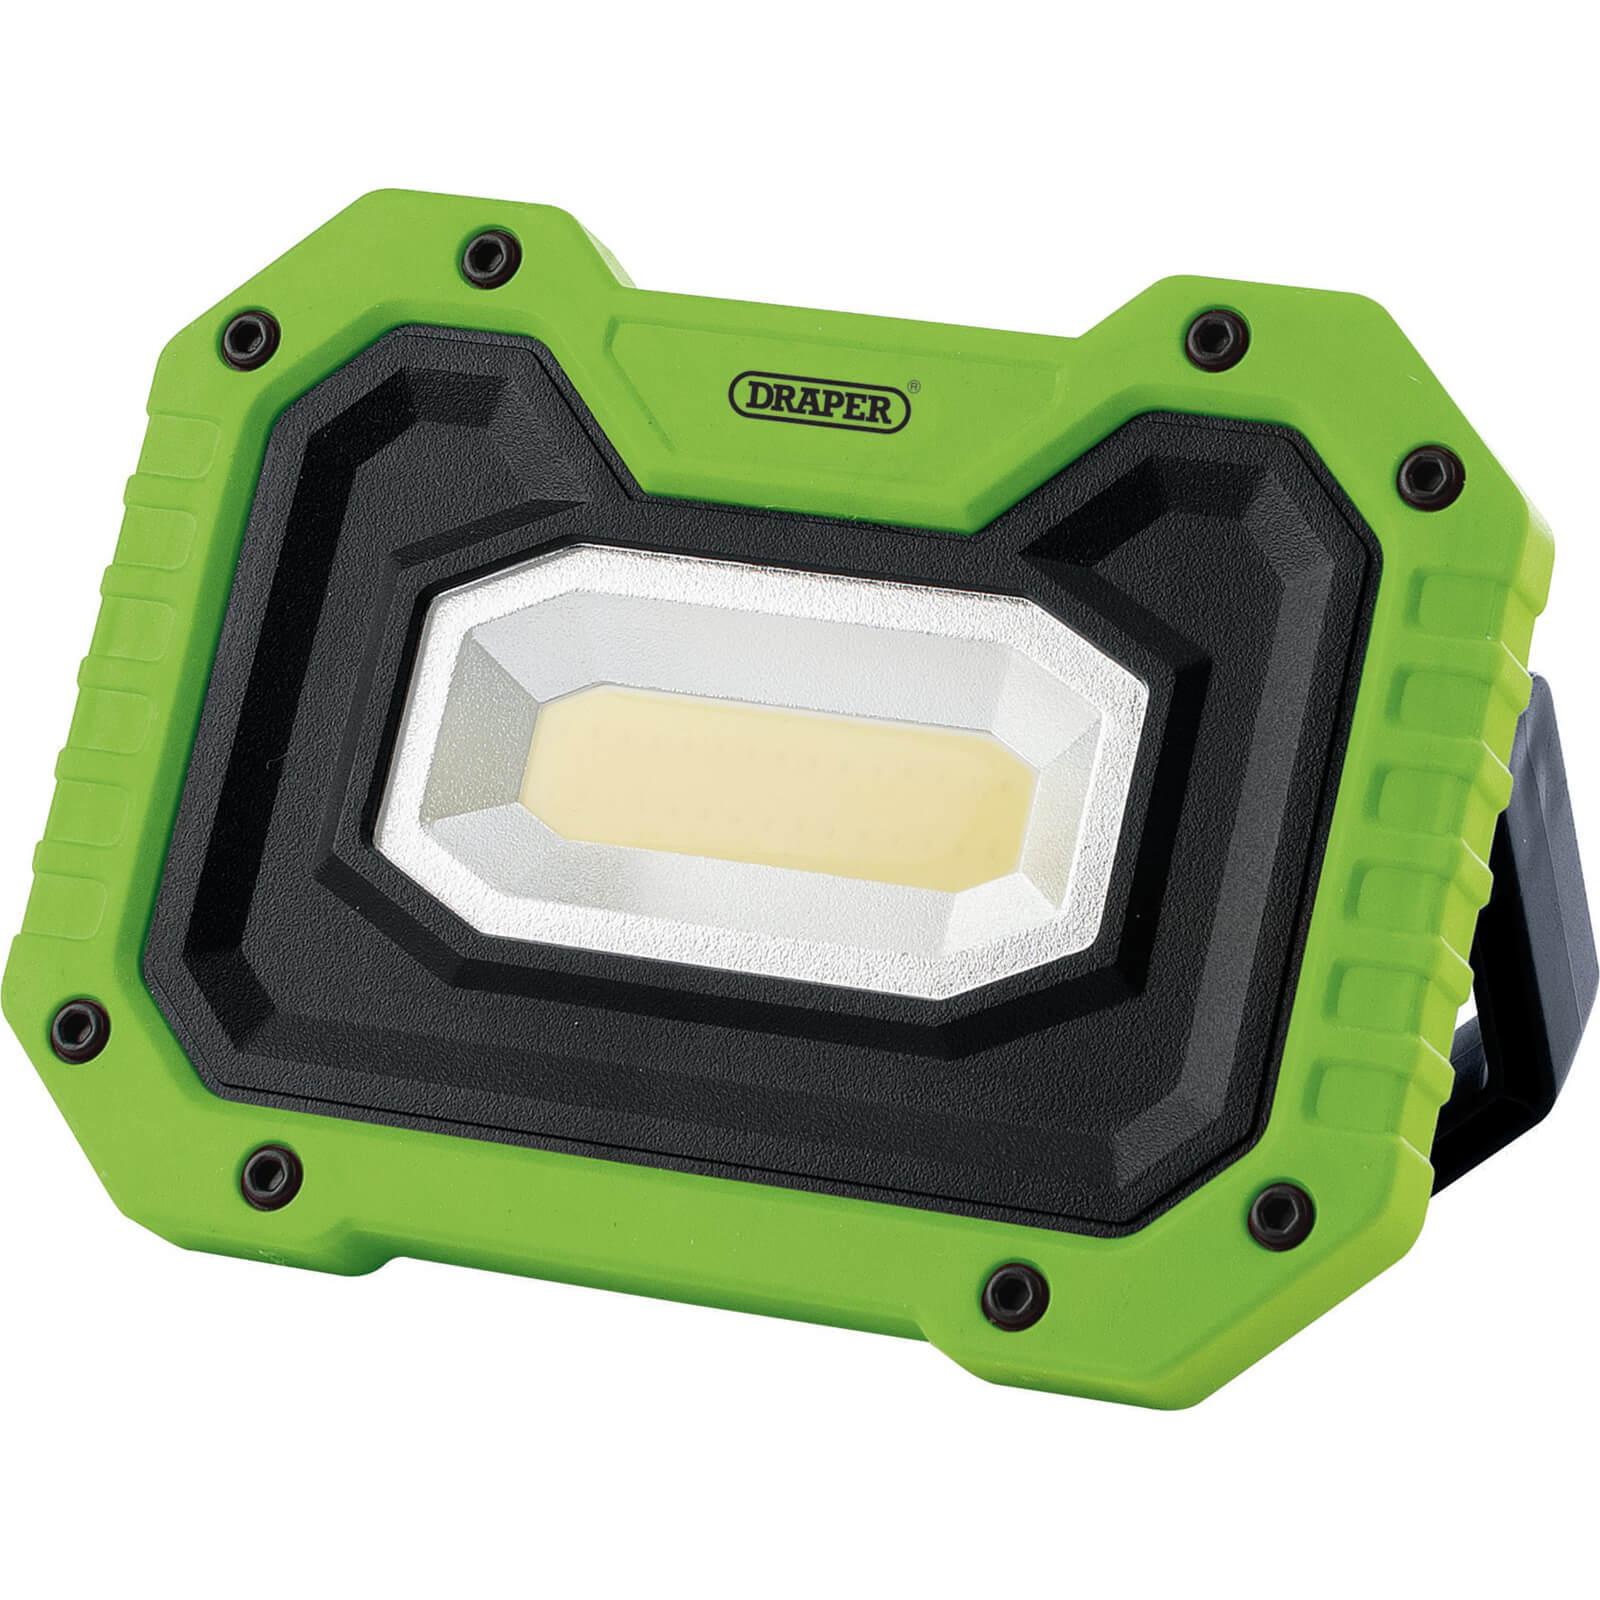 Draper Rechargeable Work Light Power Bank and Wireless Speaker Green